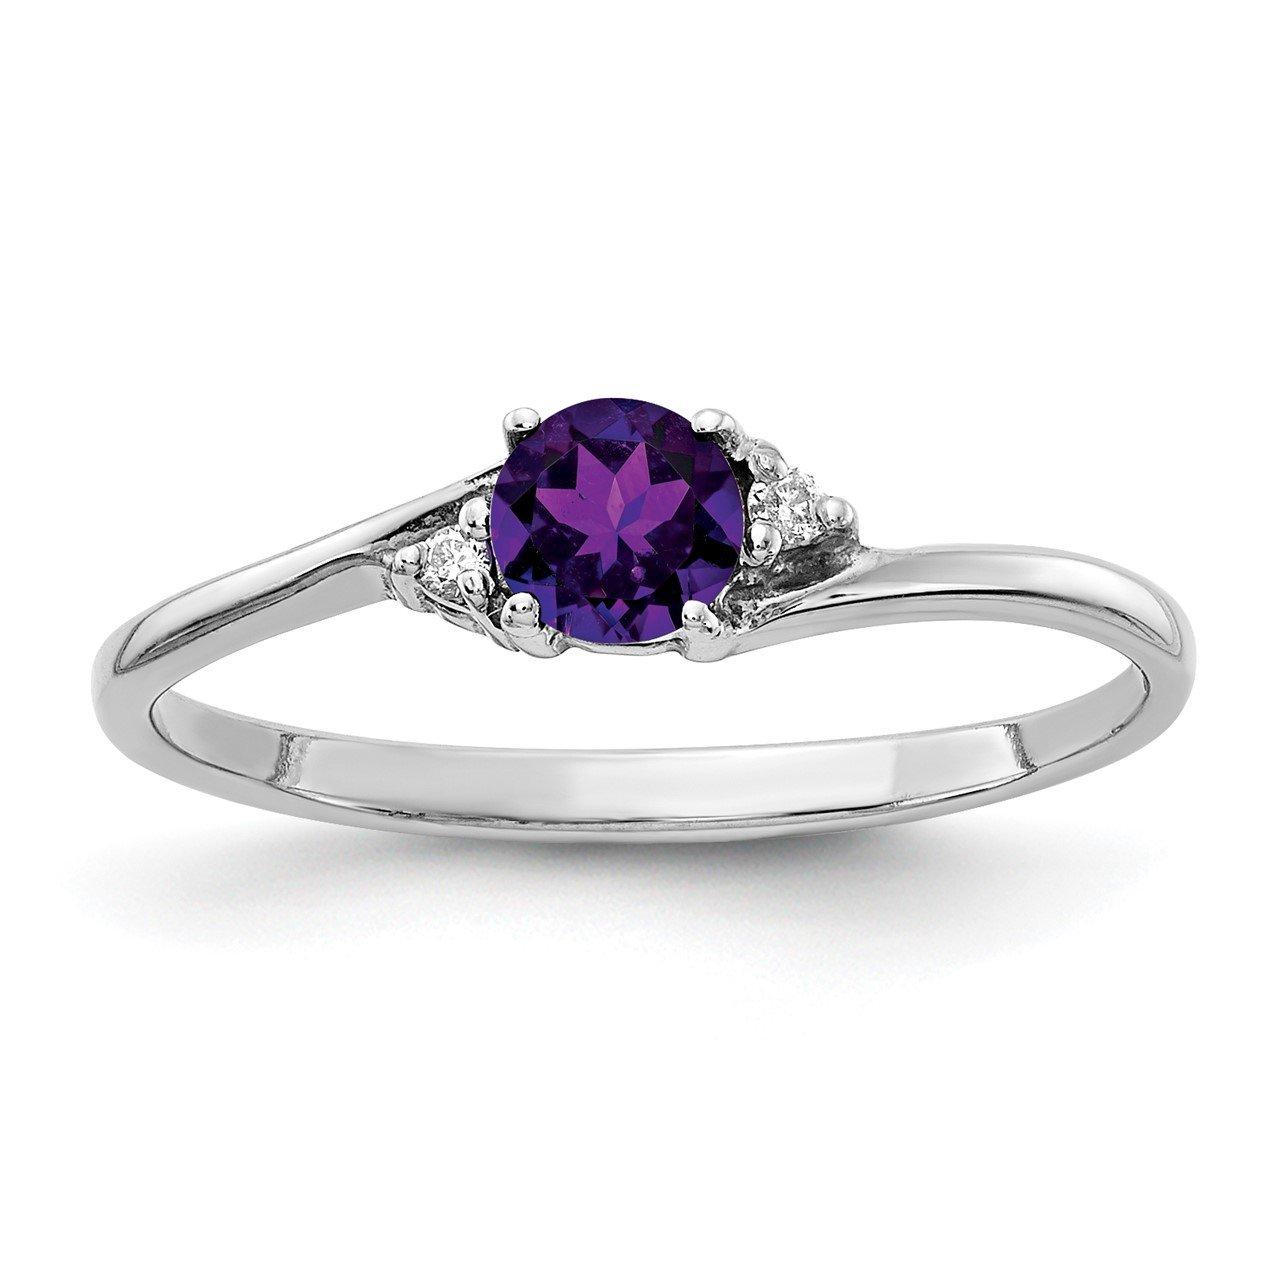 14k White Gold Diamond and Gemstone Ring Mtg